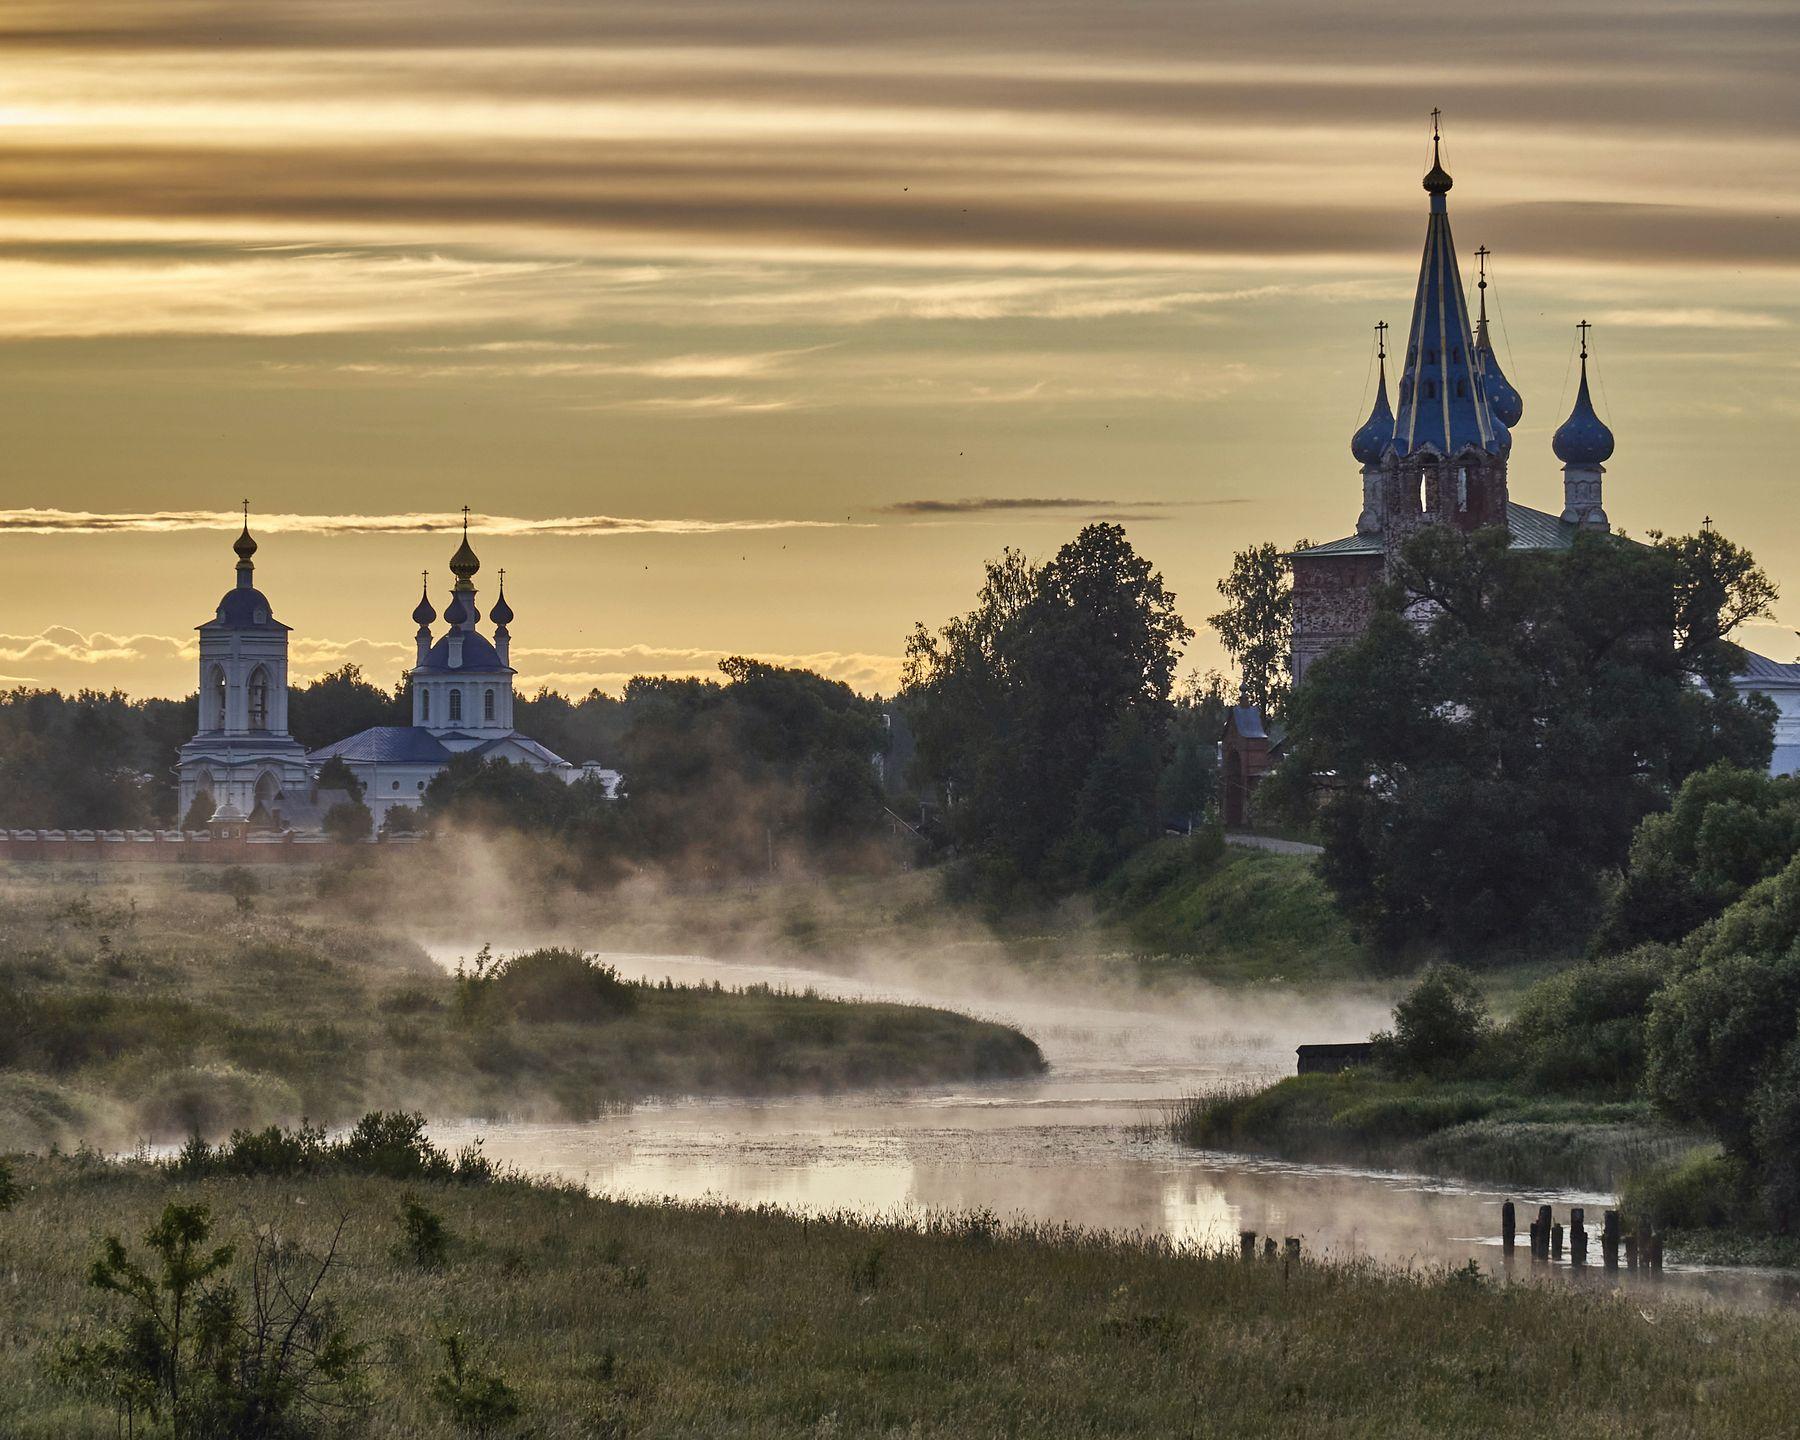 Мистика раннего утра в Дунилово дунилово река Теза утро туман лето монастырь